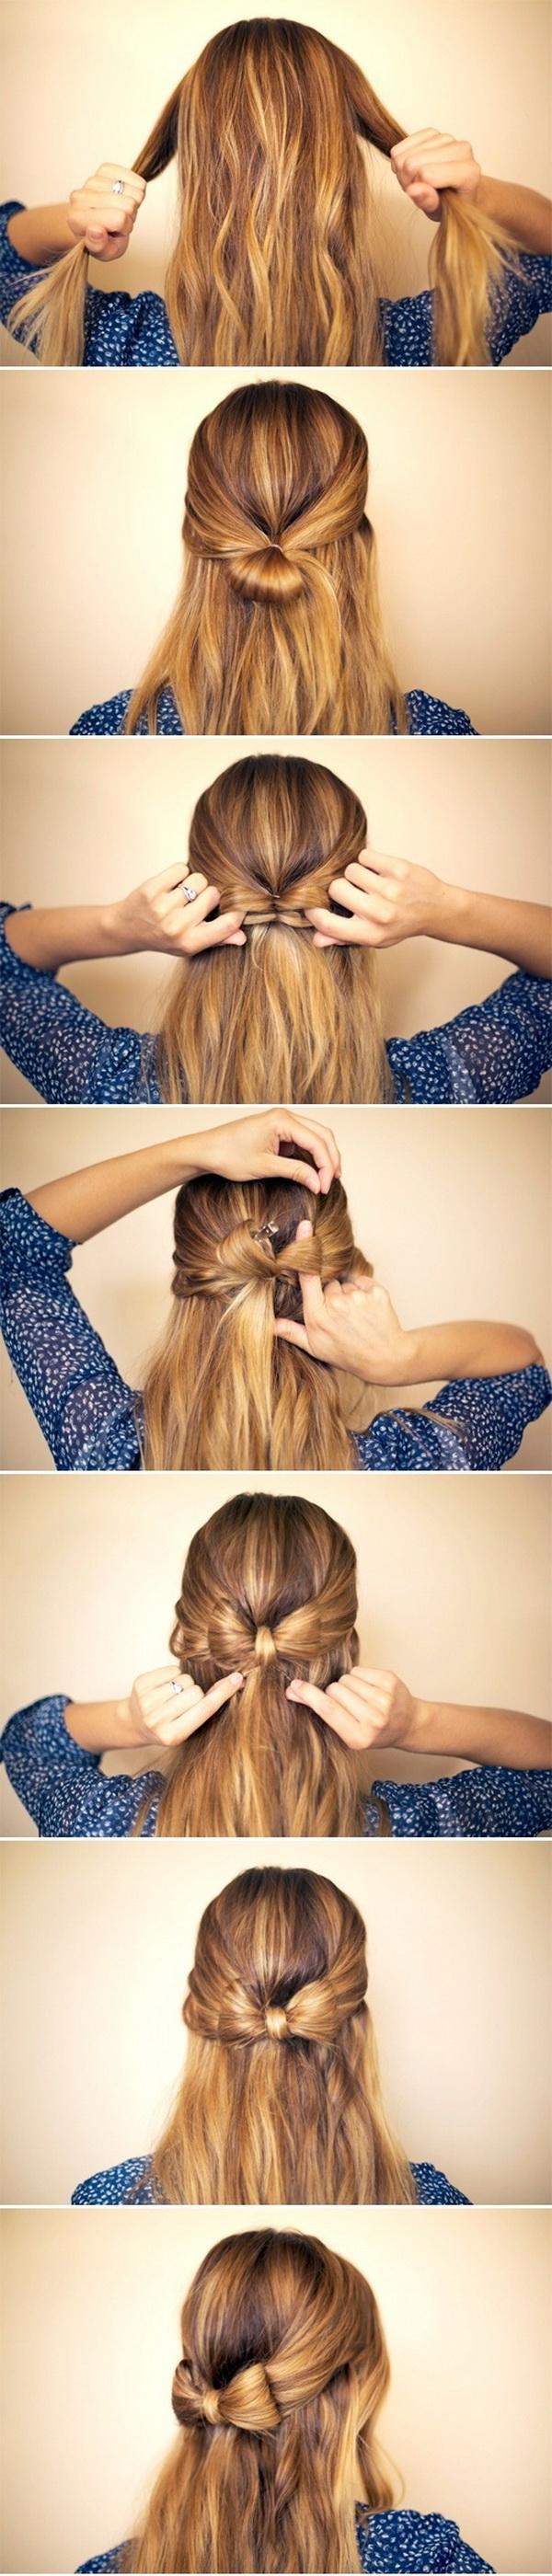 Peachy 55 Stunning Half Up Half Down Hairstyles Styletic Short Hairstyles For Black Women Fulllsitofus